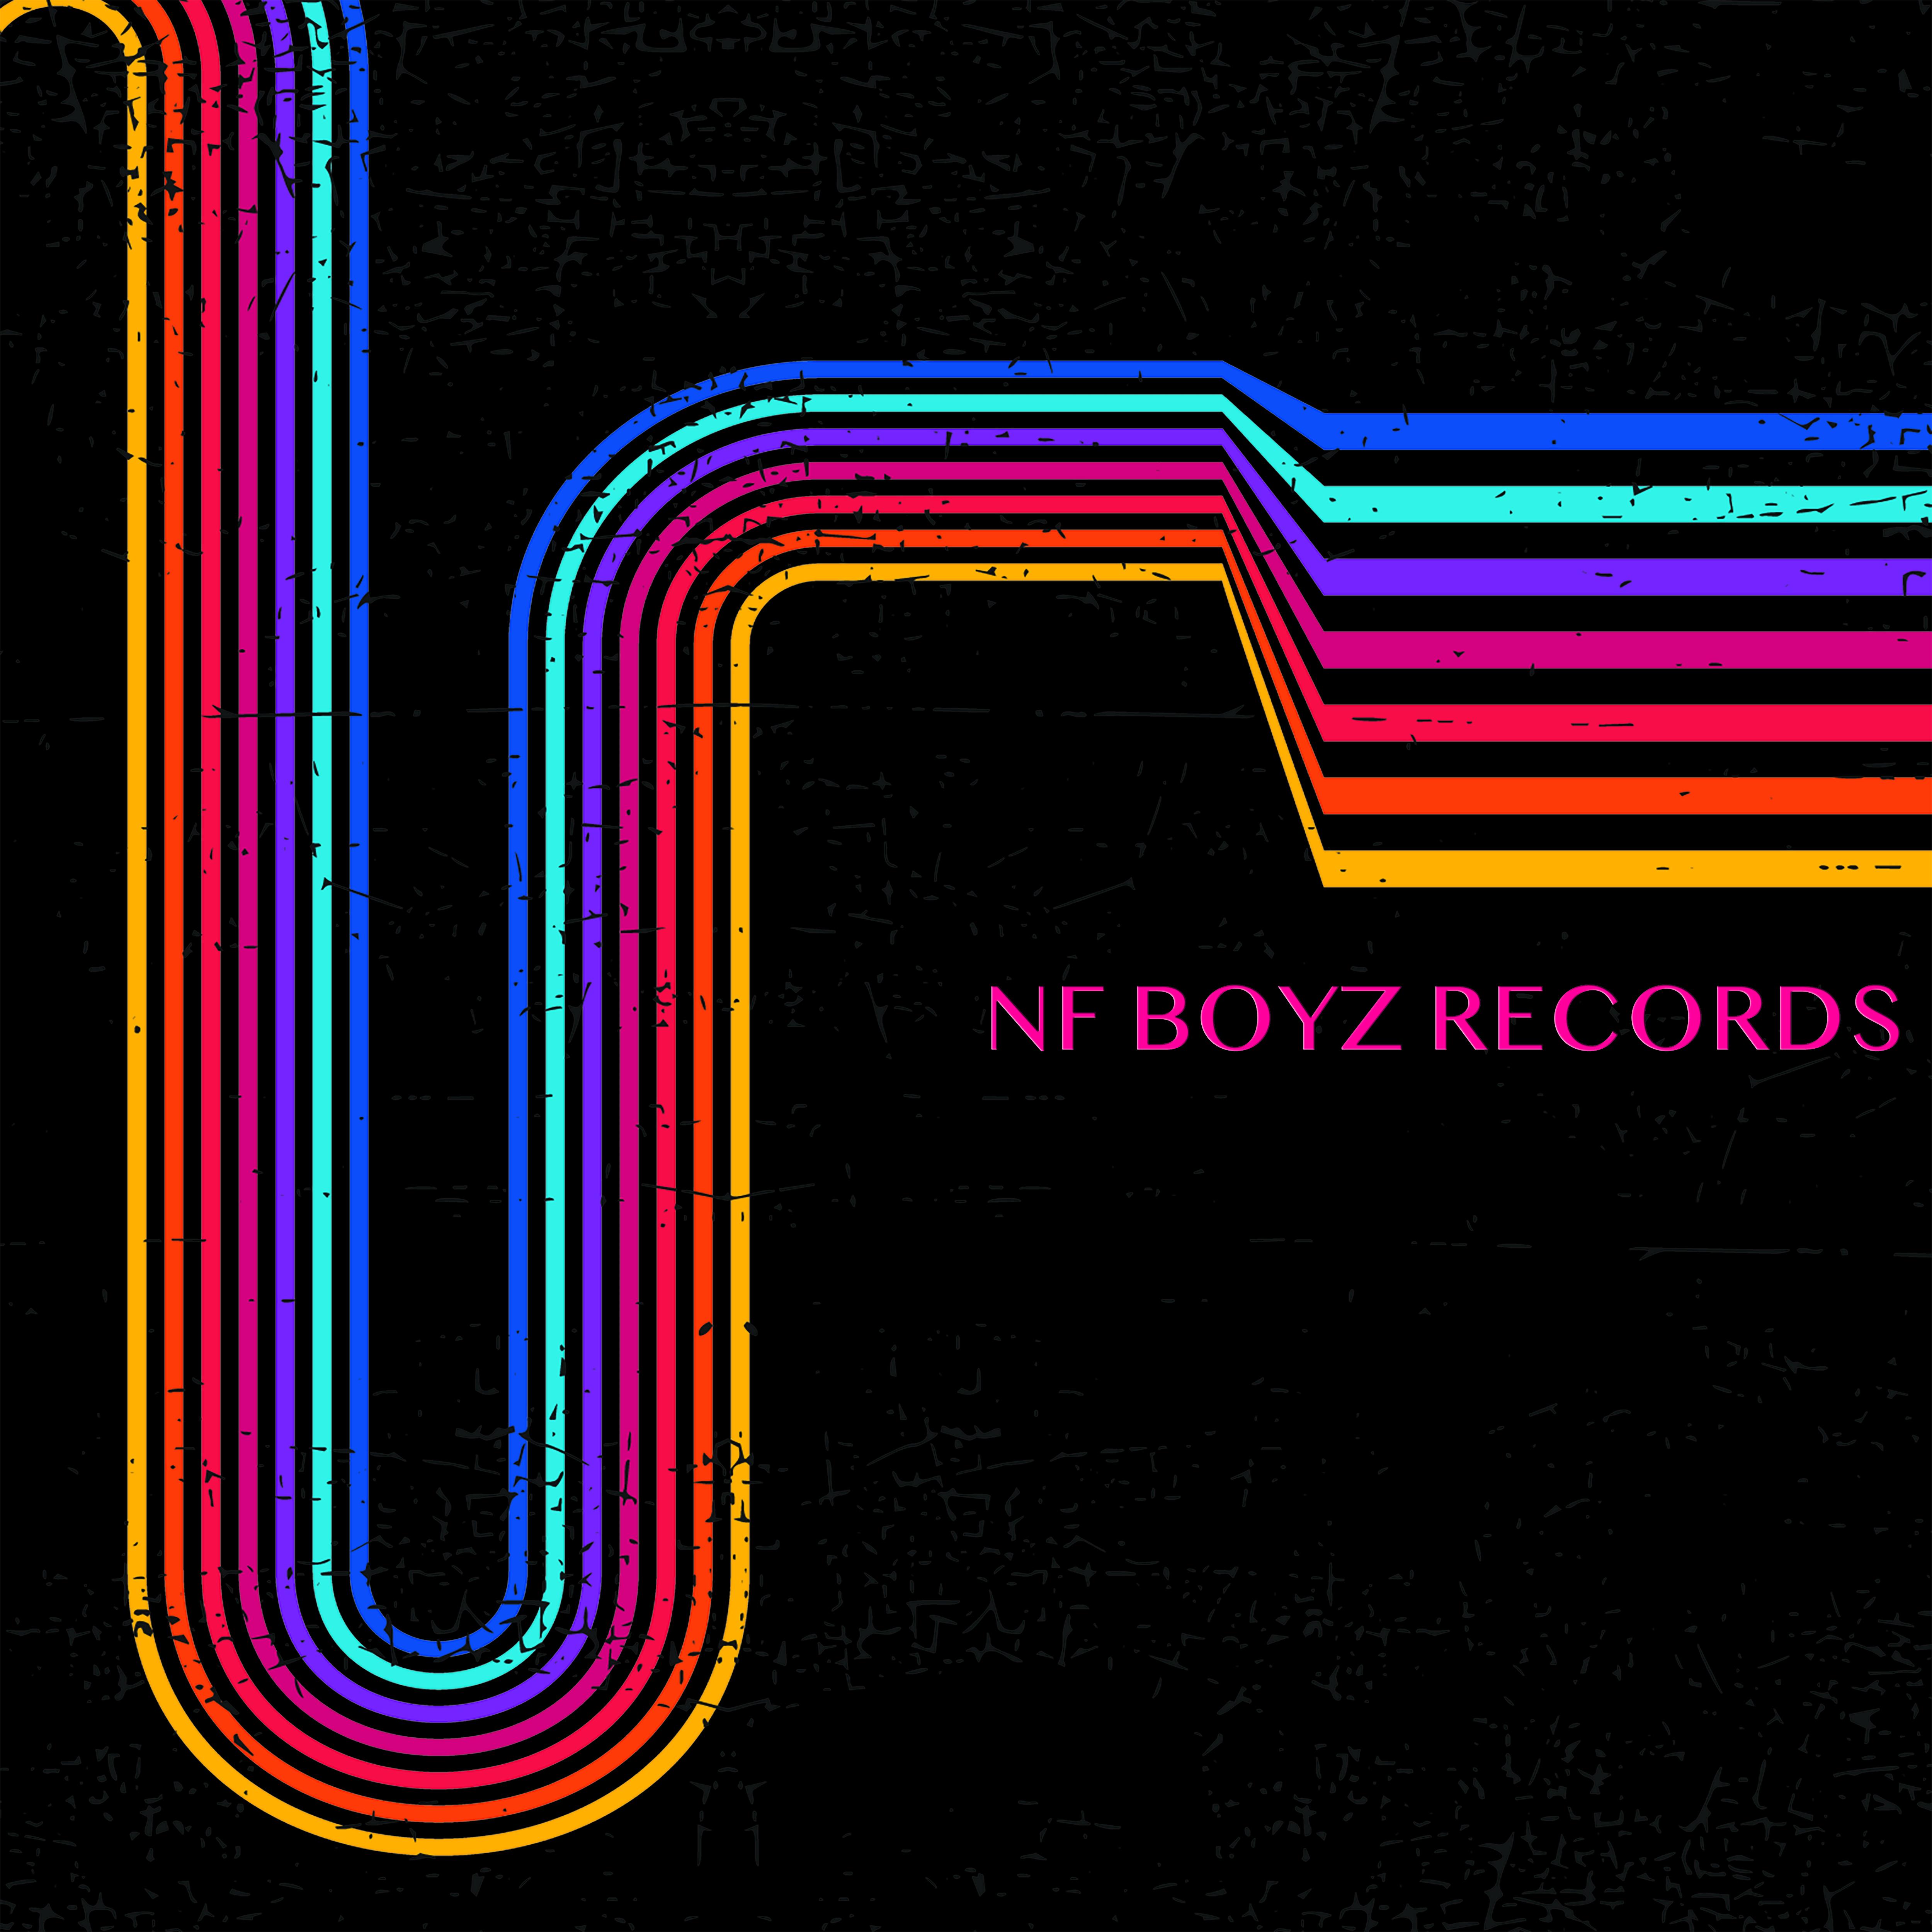 NF Boyz Records